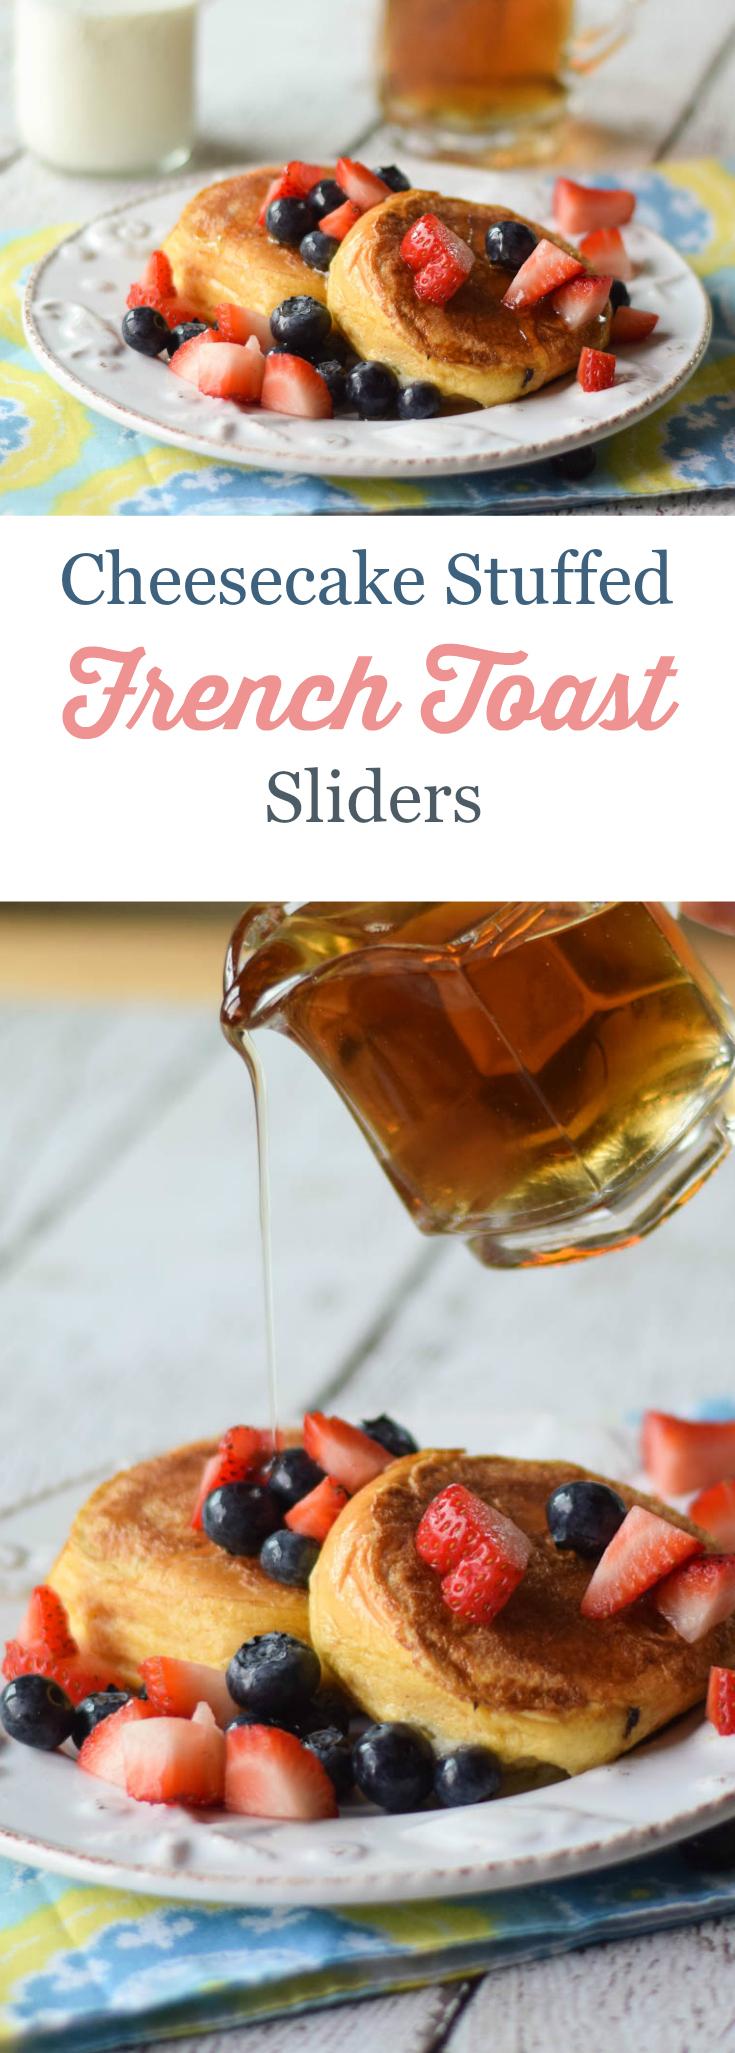 Cheesecake Stuffed French Toast Sliders